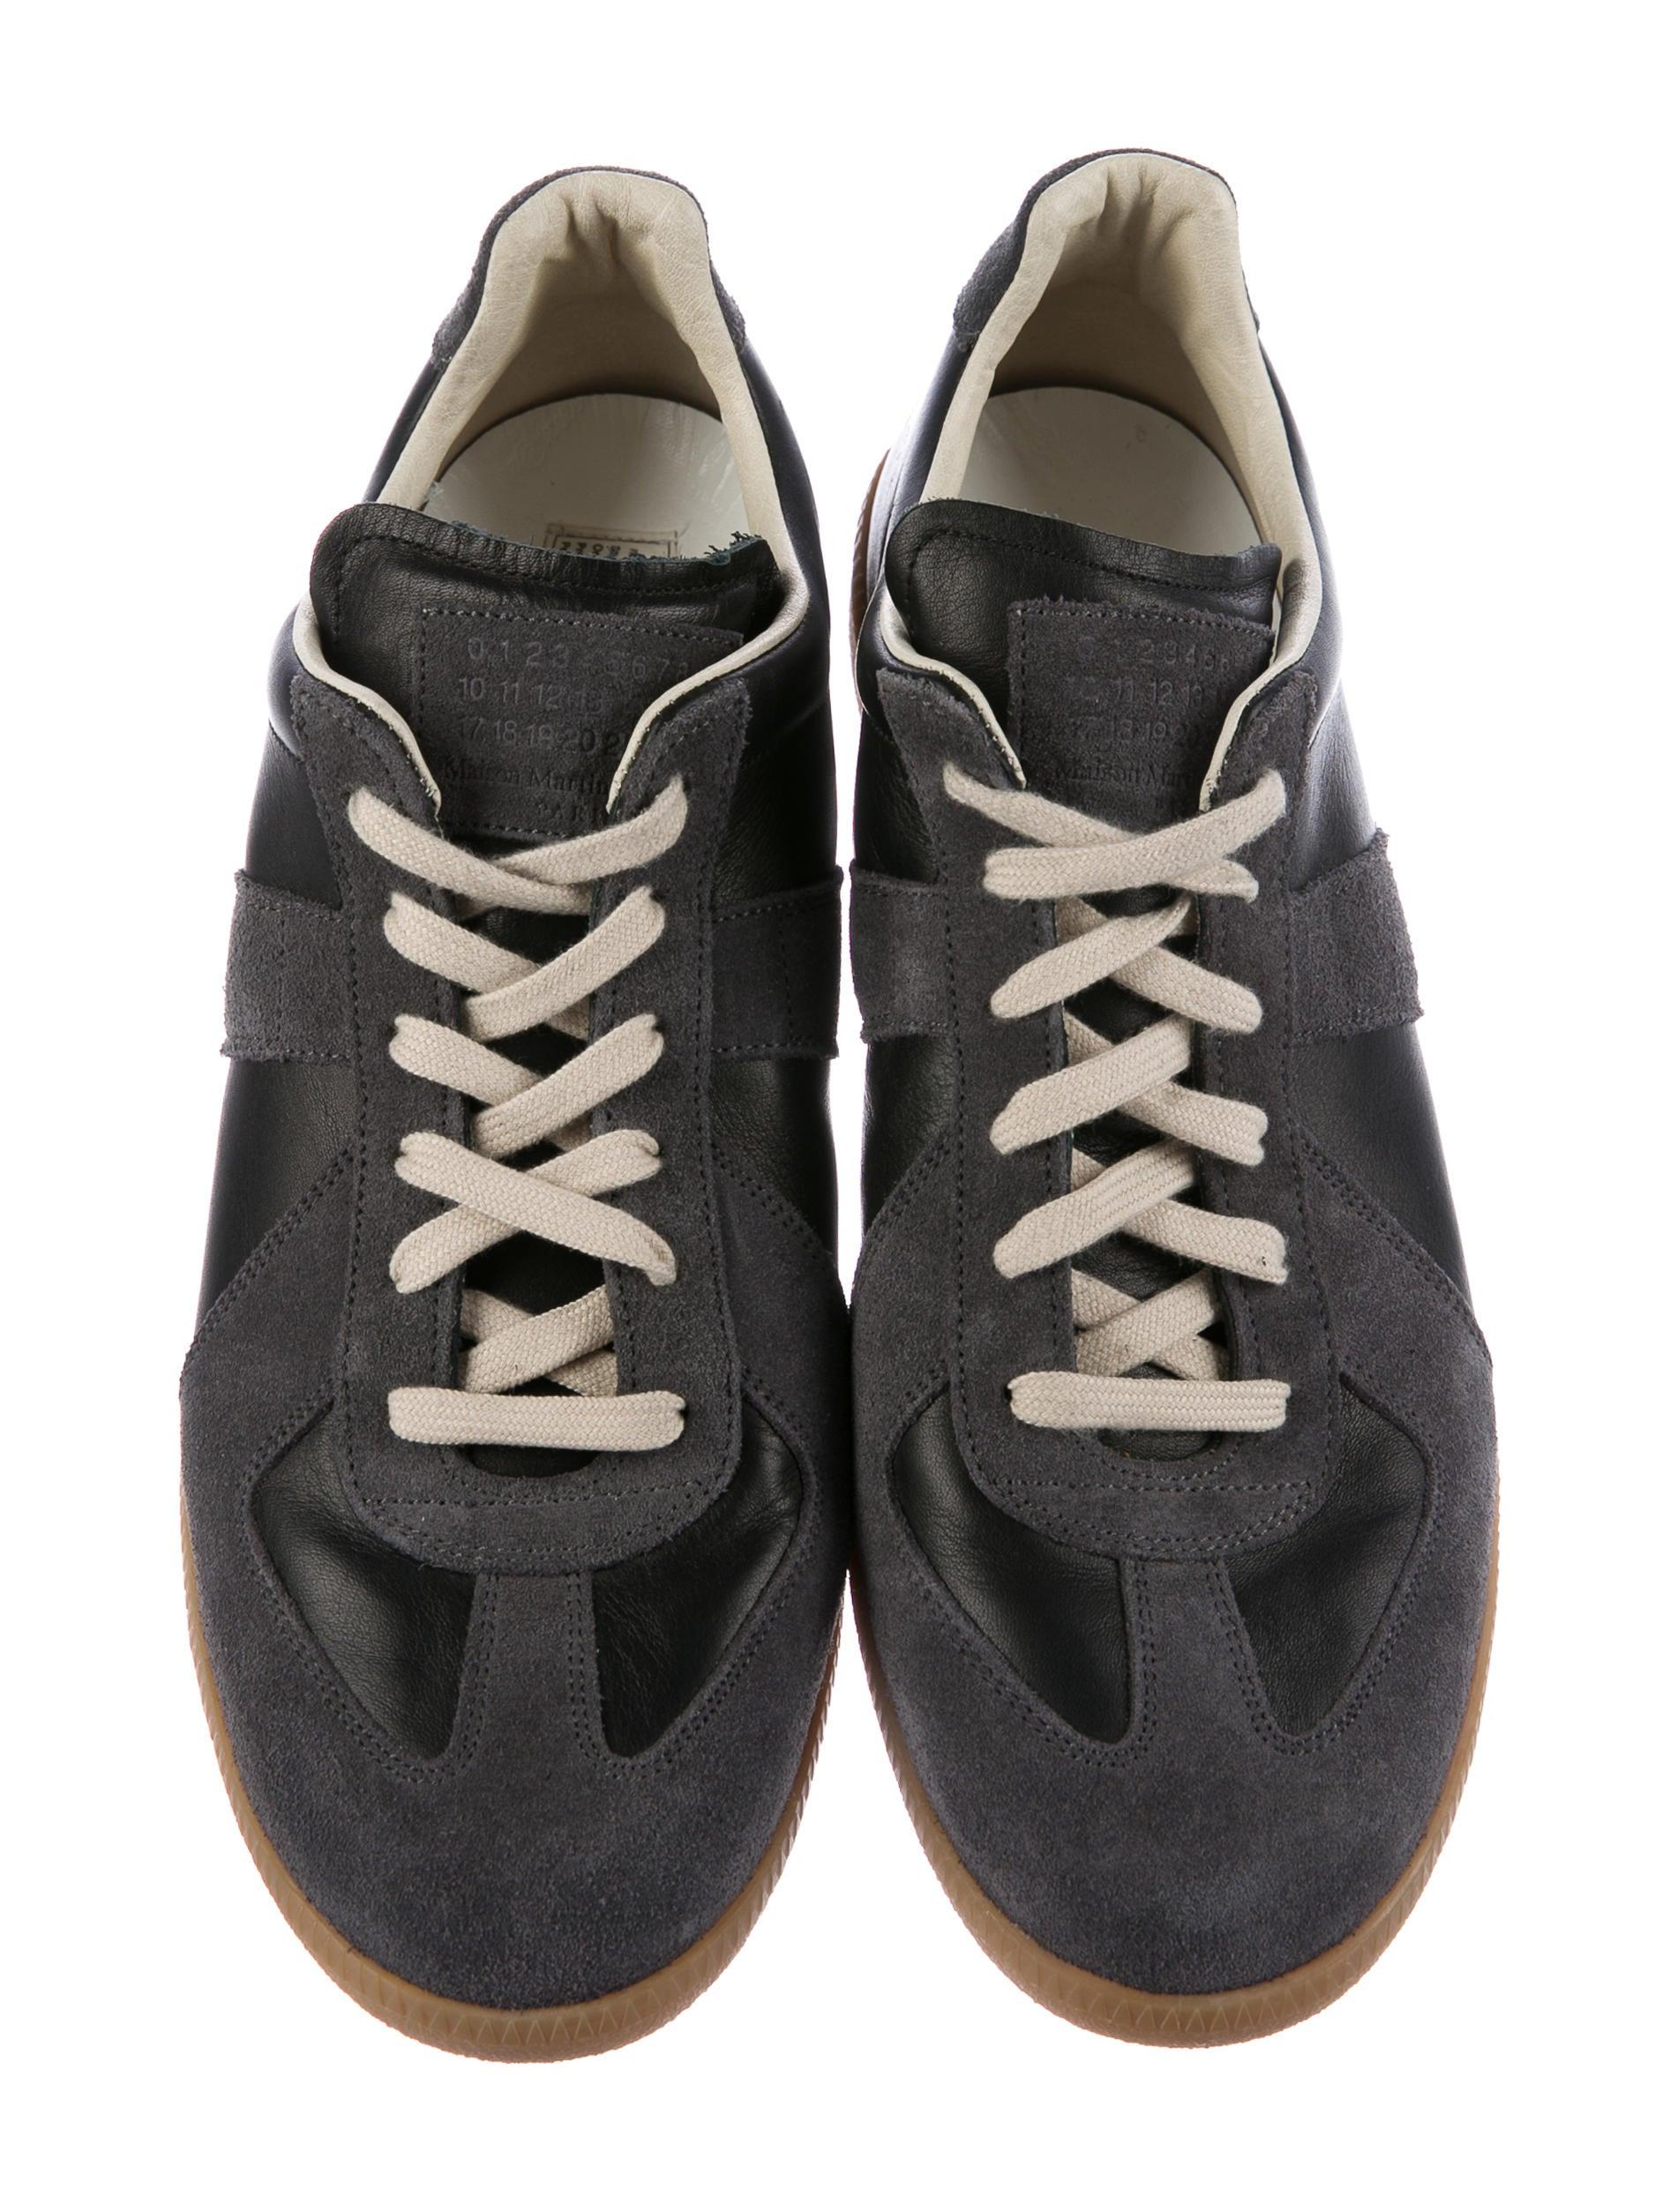 maison margiela replica leather sneakers shoes mai31807 the realreal. Black Bedroom Furniture Sets. Home Design Ideas